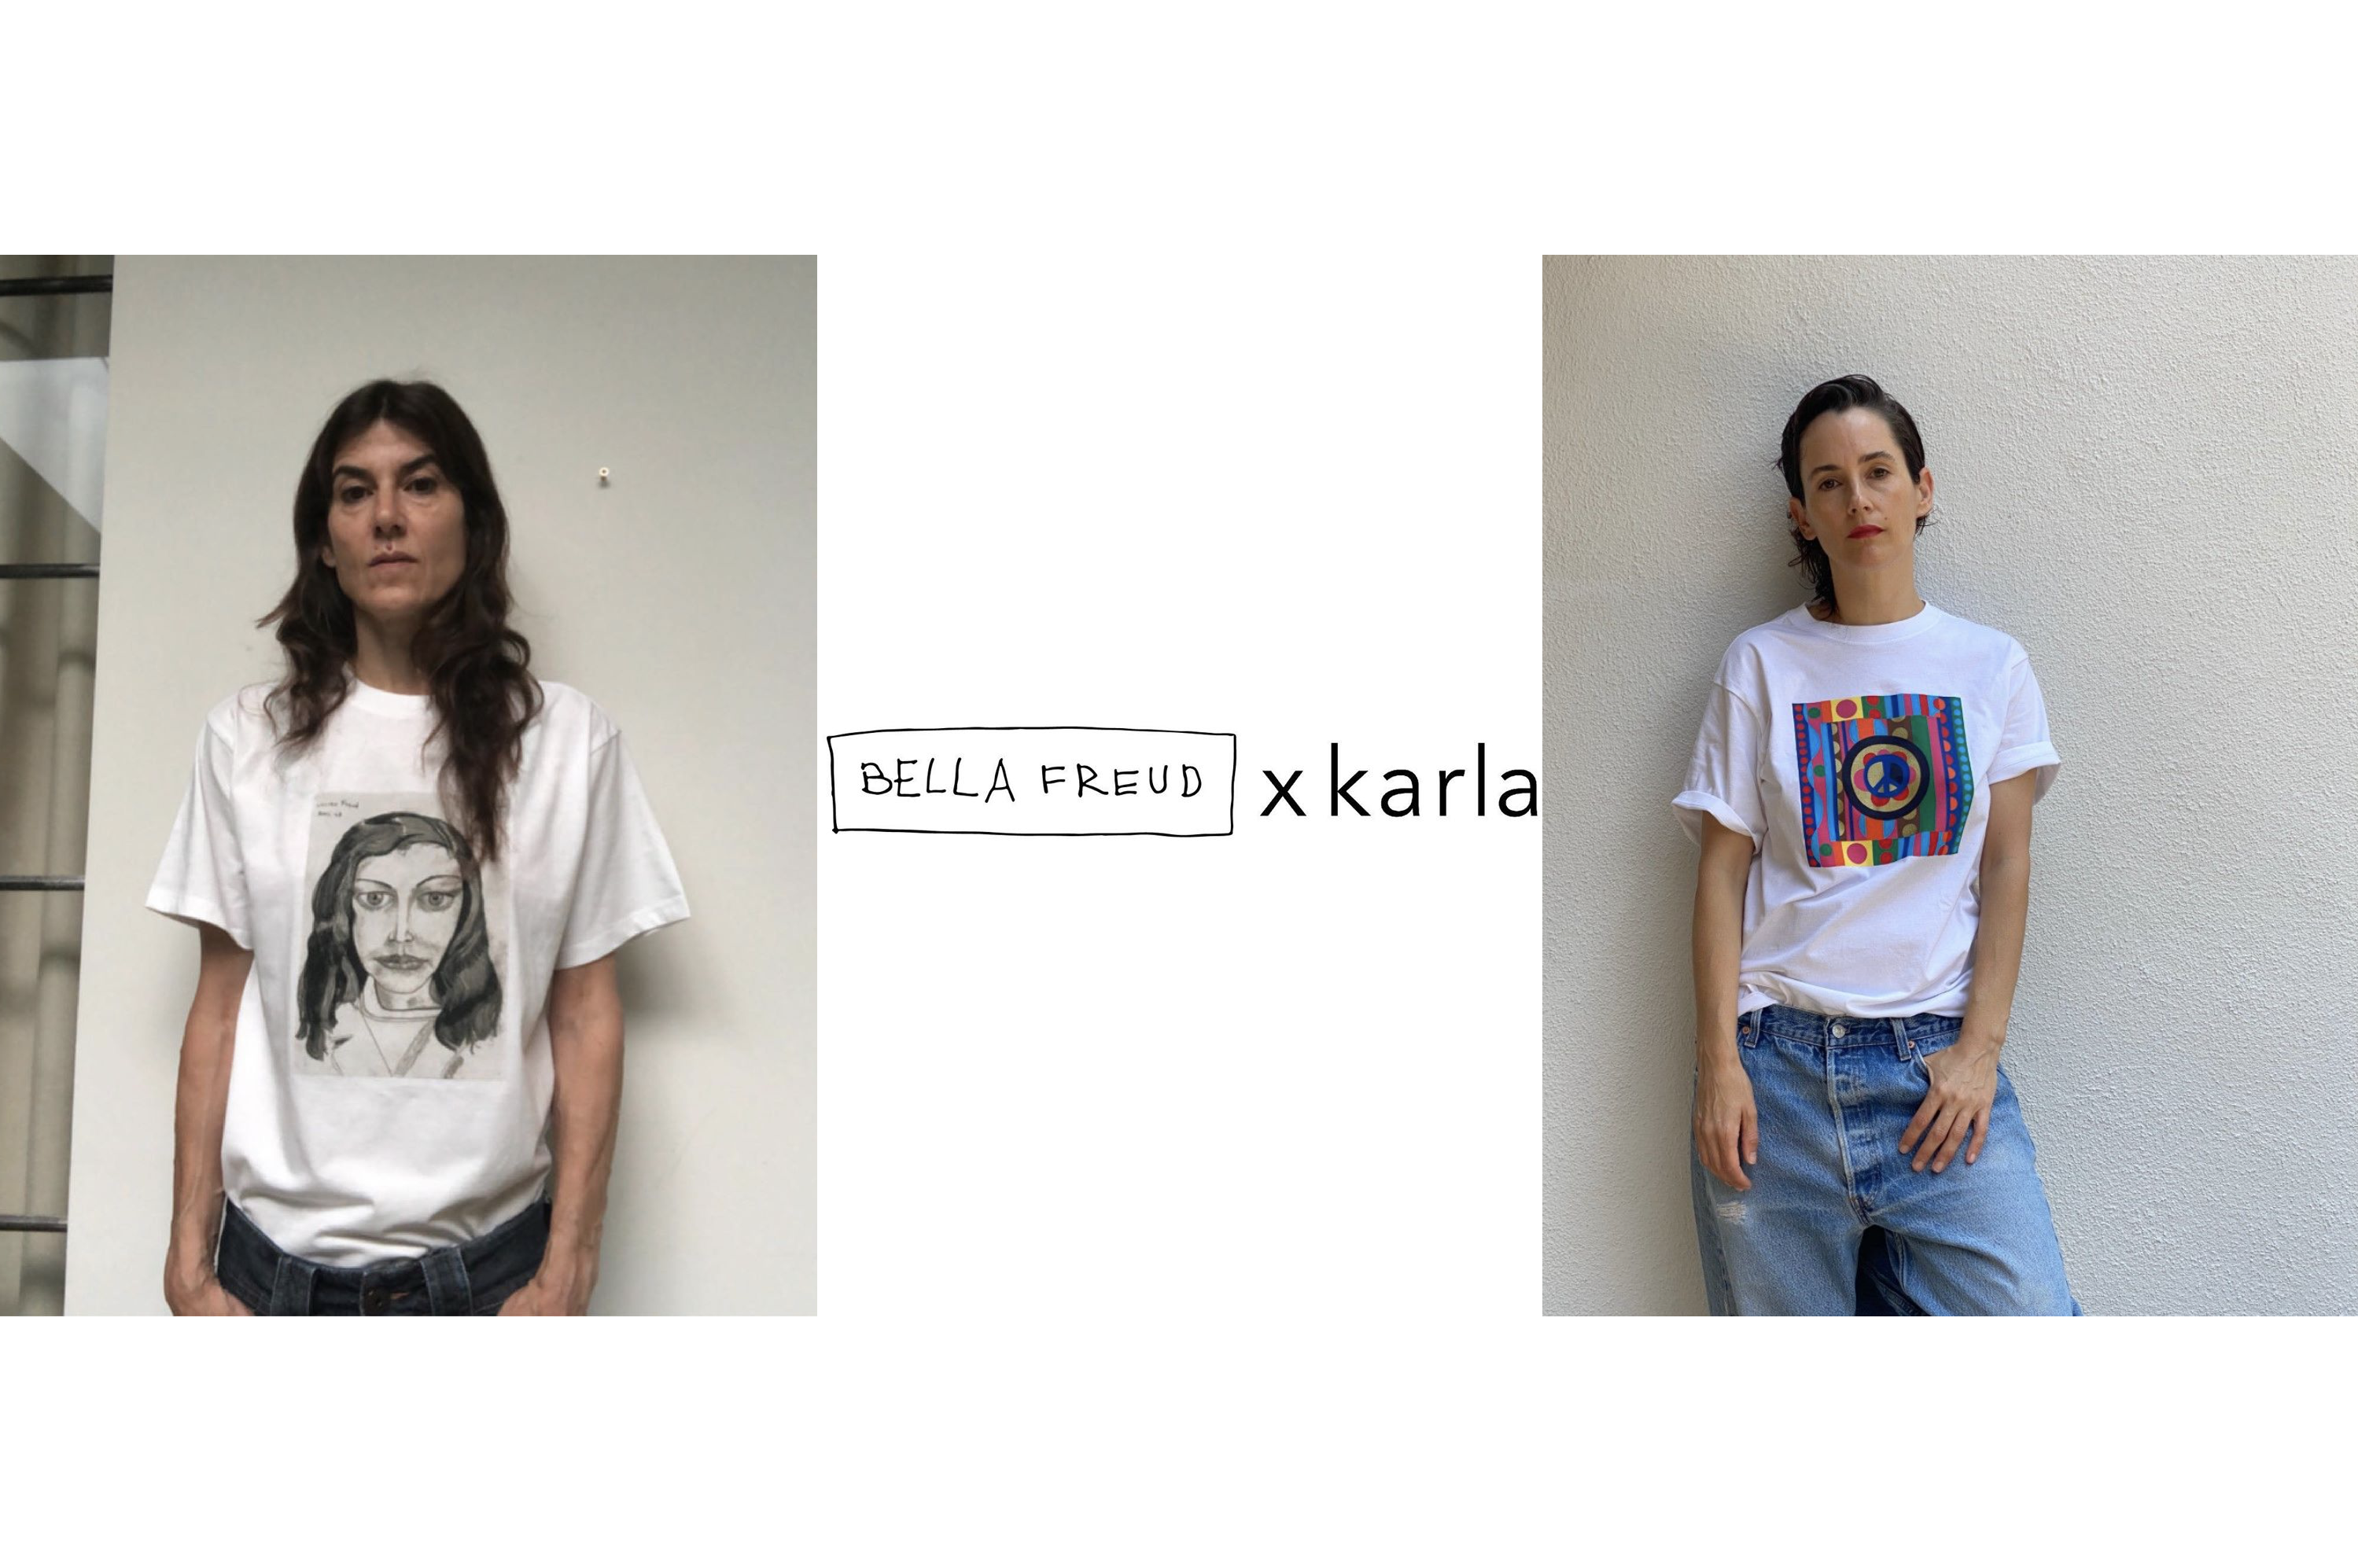 Bella Freud & Karla Welch Team for Charities